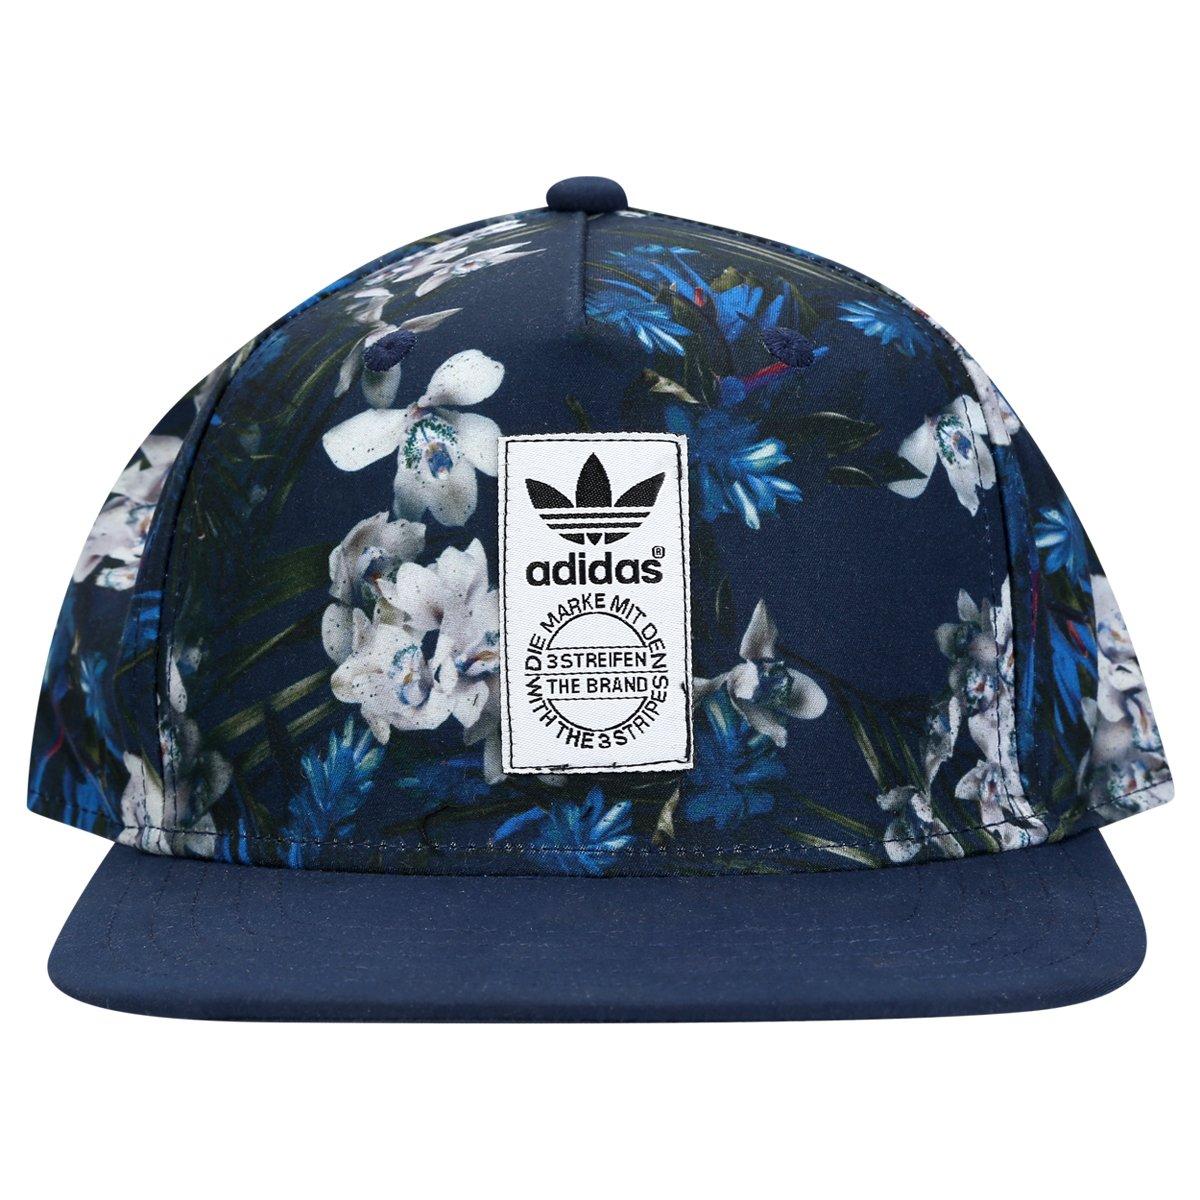 0cc0ad2d9fad4 Boné Adidas Dark Floral - Compre Agora